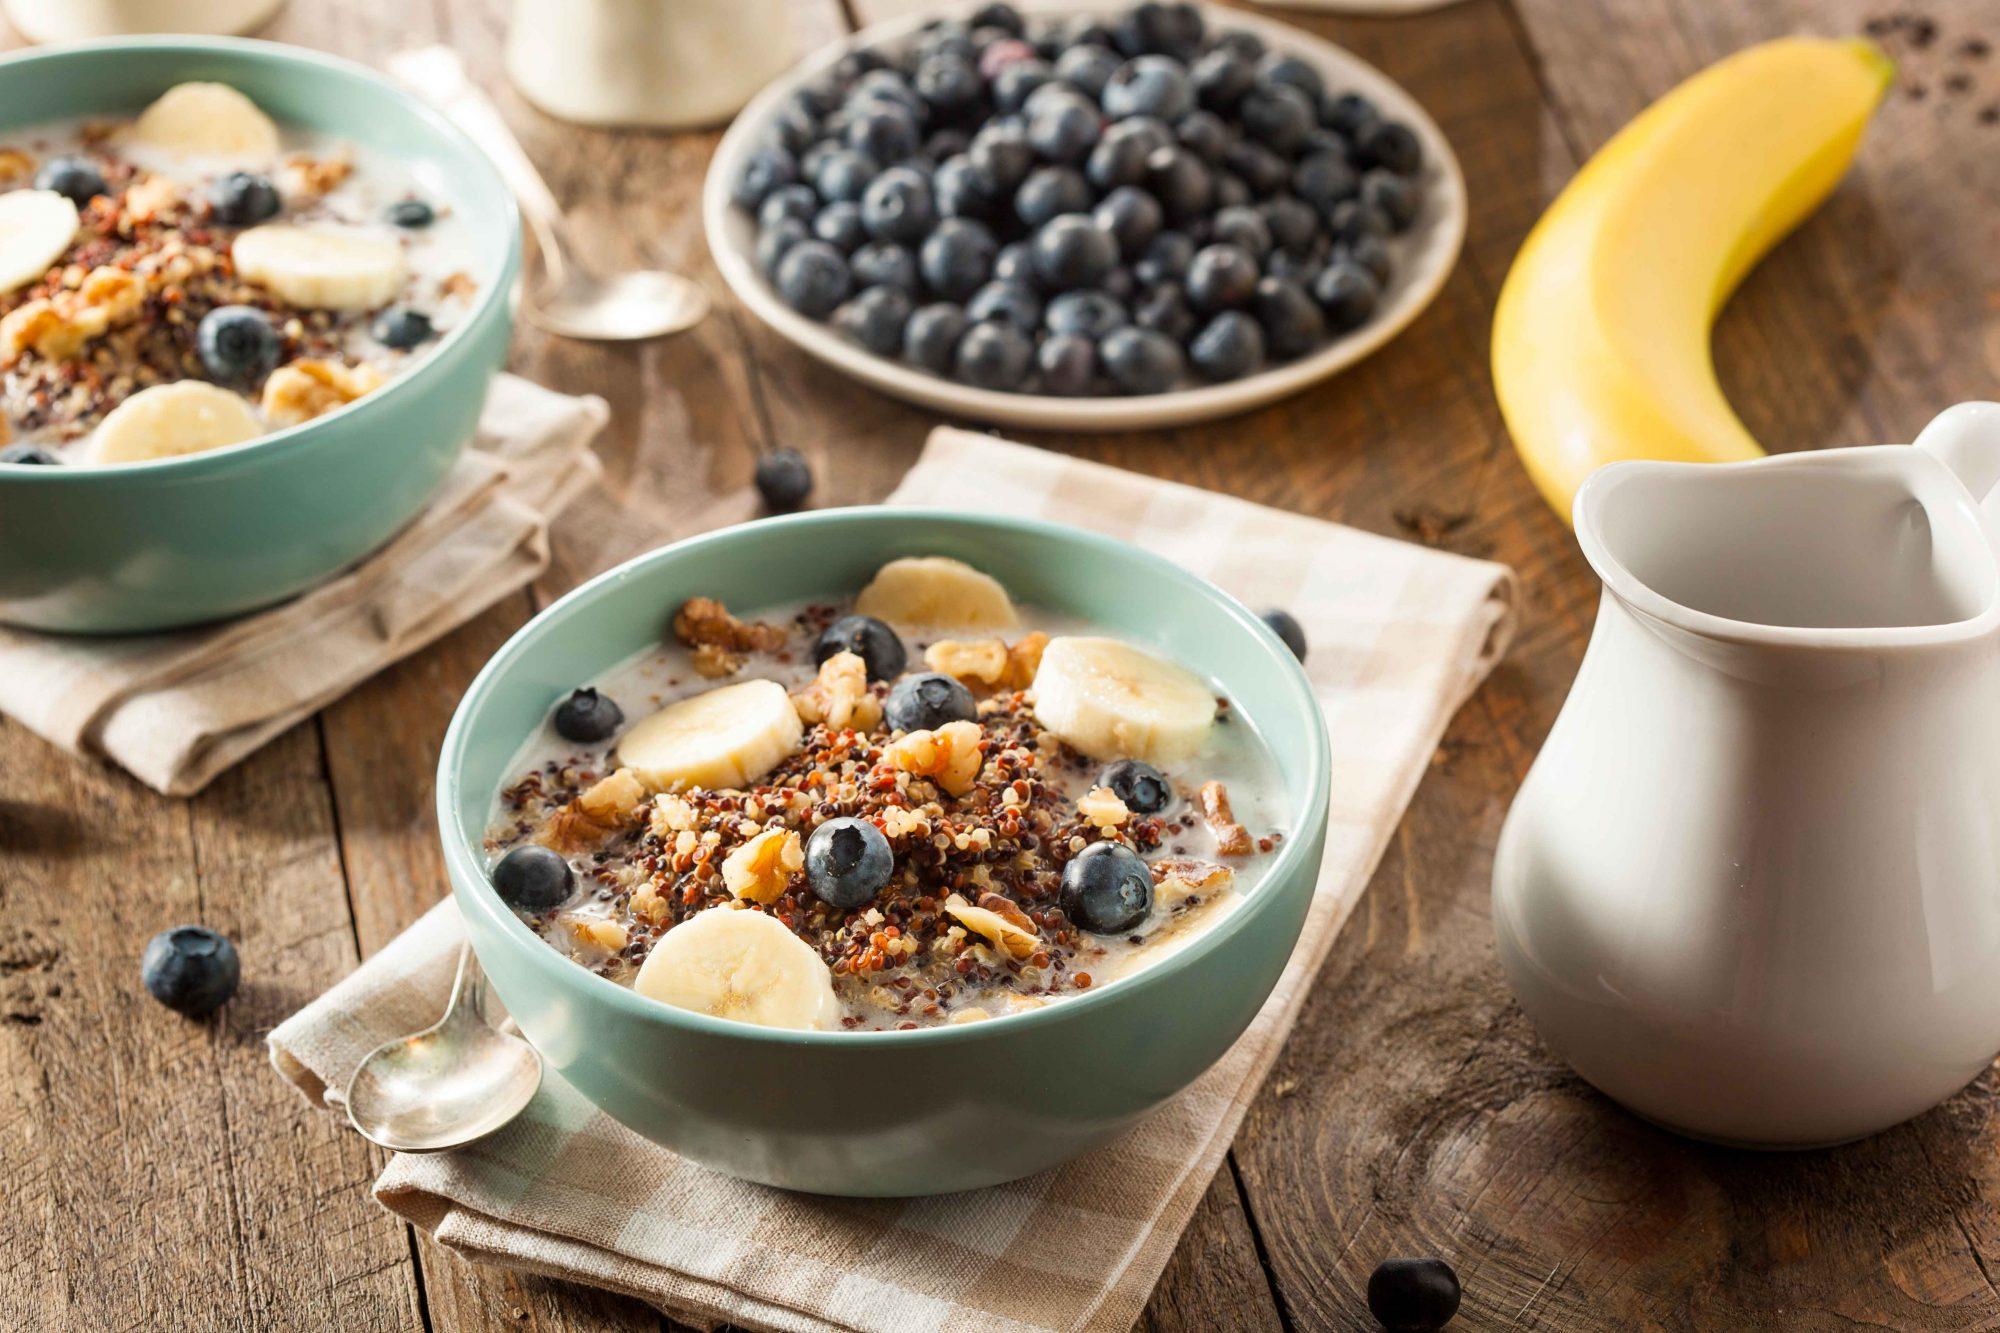 EC: How to Eat Breakfast Like a Wellness Blogger